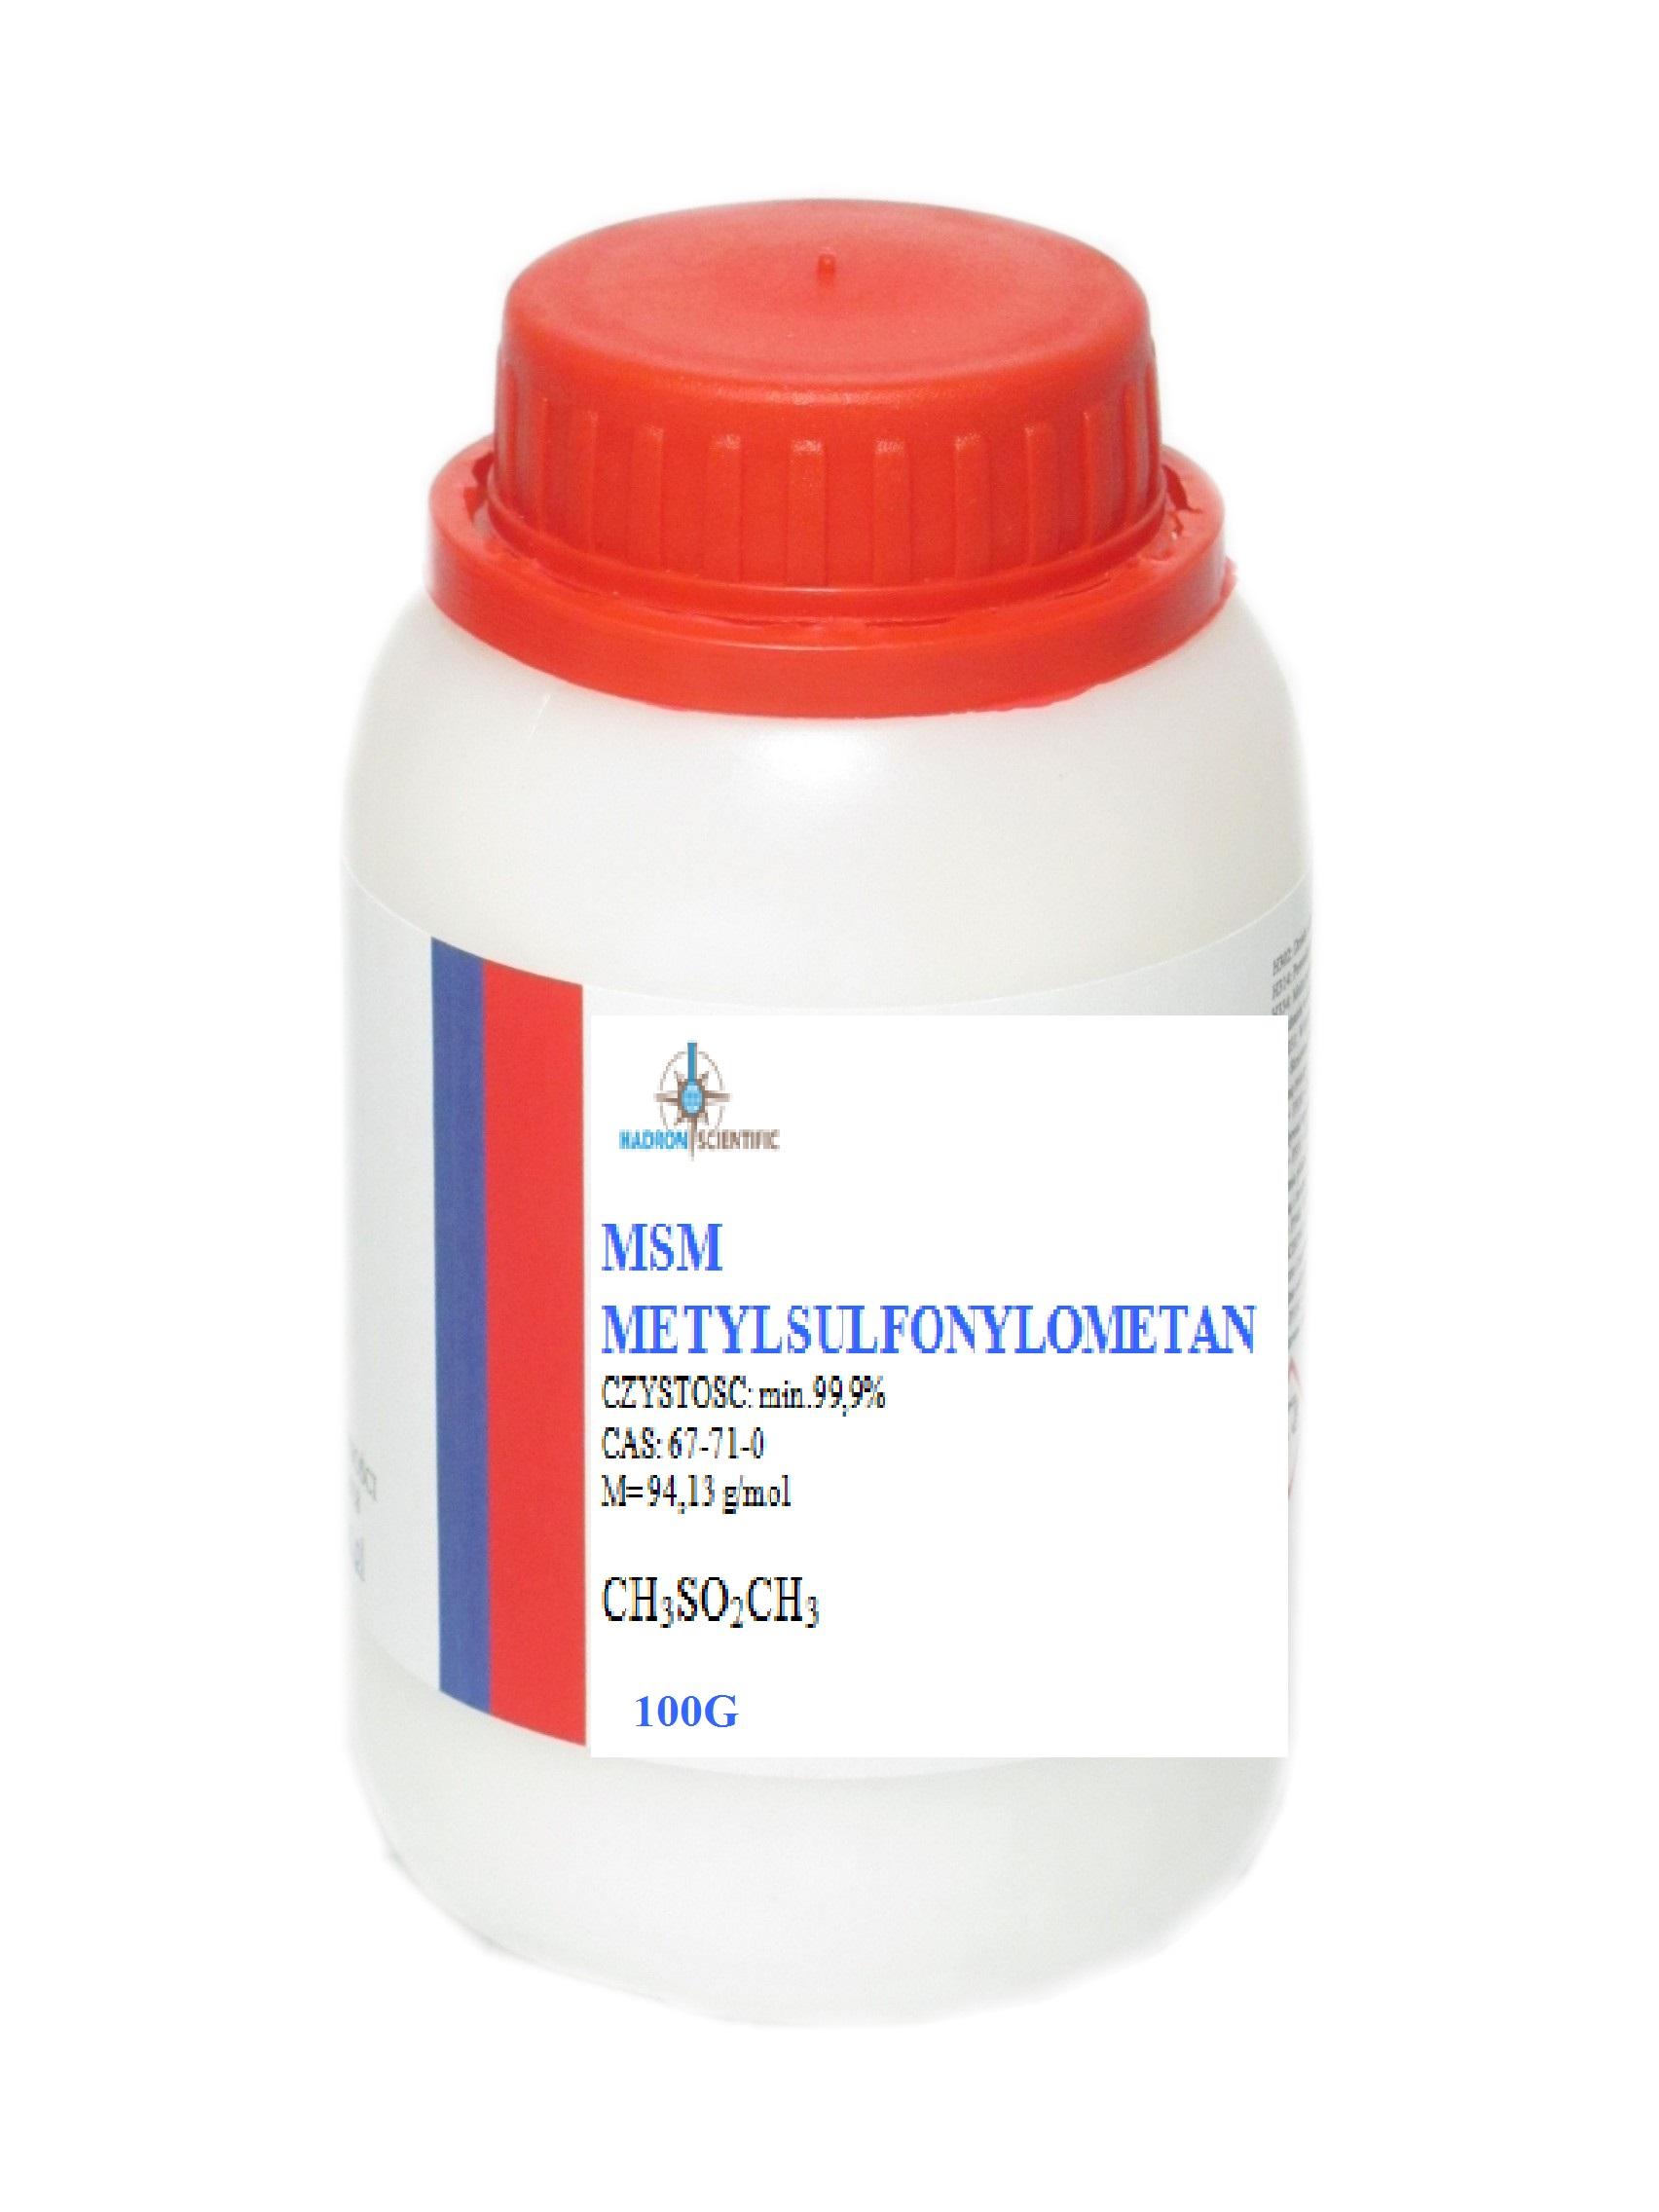 MSM metylsulfonylmetán organická síra - 100 g